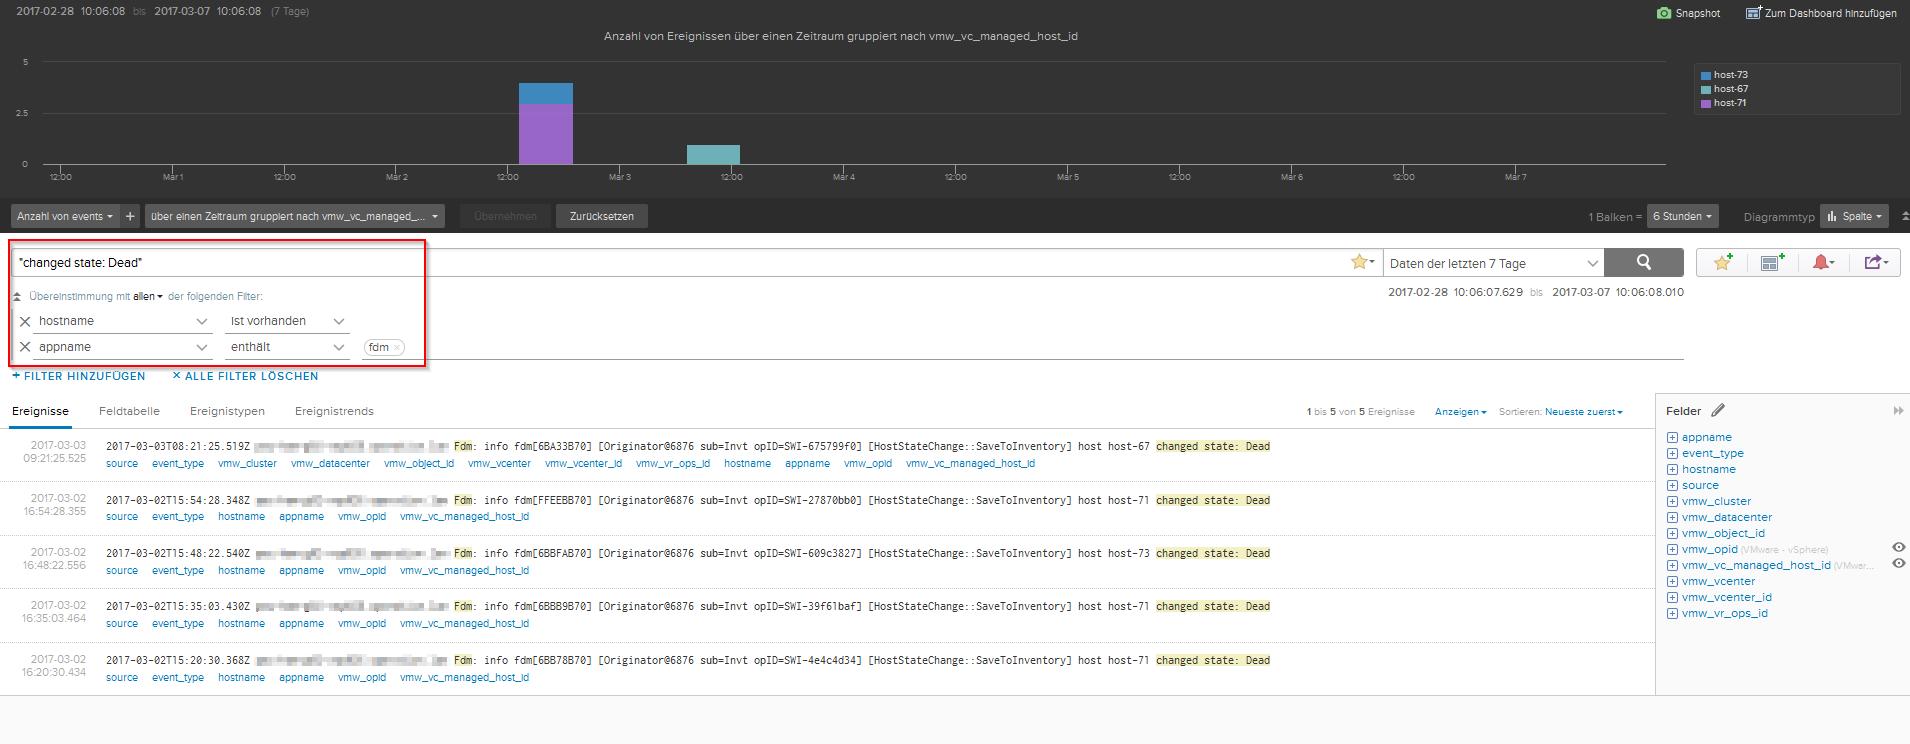 vRealize Log Insight - FDM - vSphere HA isolation Events